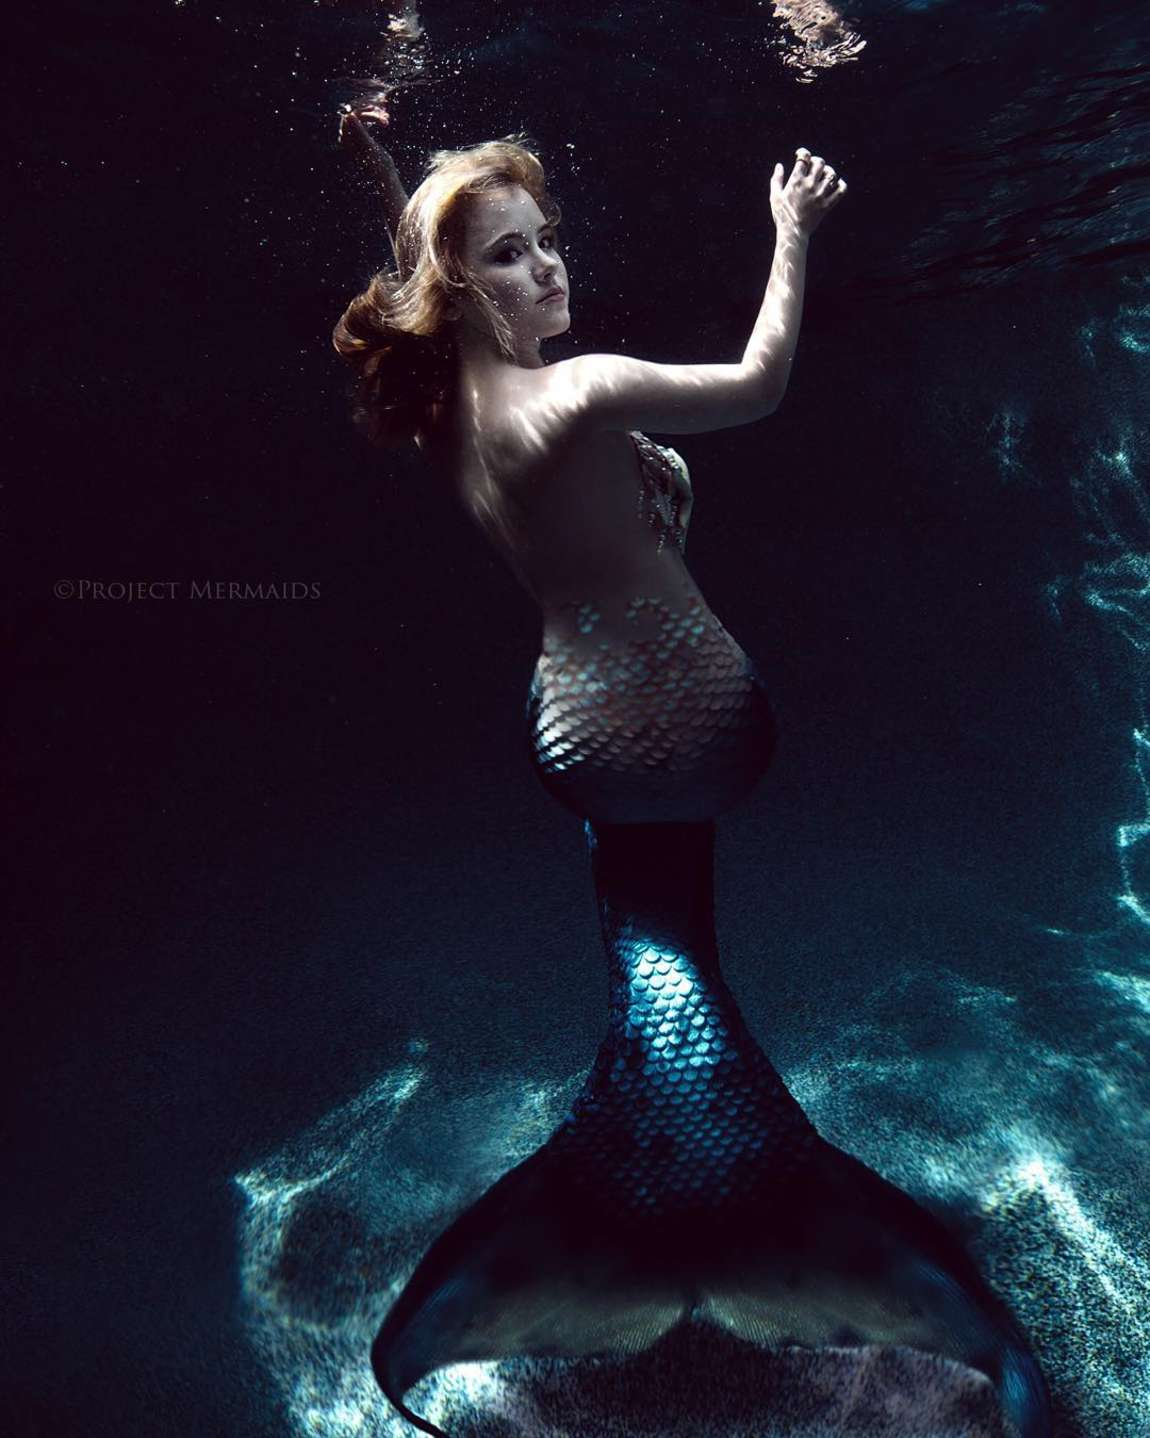 foto-sirene-project-mermaids-angelina-venturella-chiara-salomoni-25